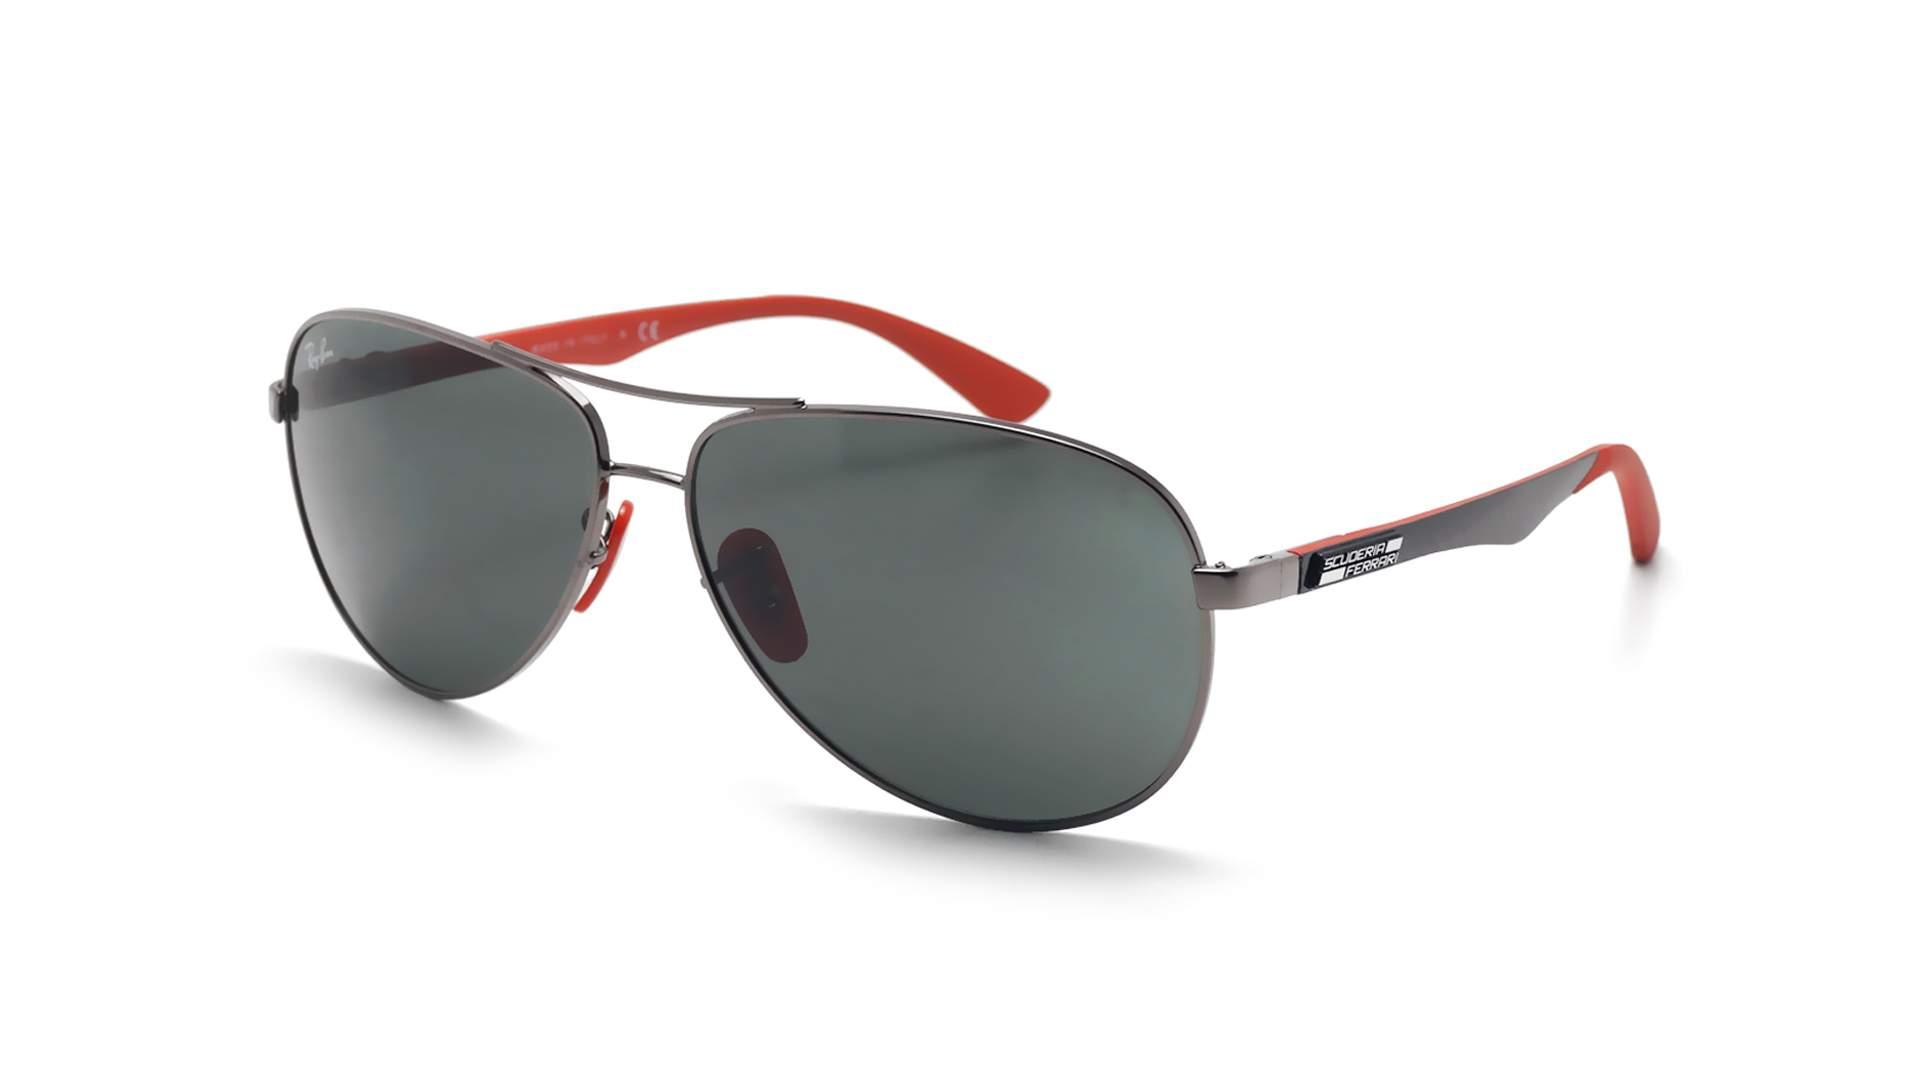 55c077baa2829c Sunglasses Ray-Ban Aviator Scuderia Ferrari Silver RB8313M F00171 61-13  Large